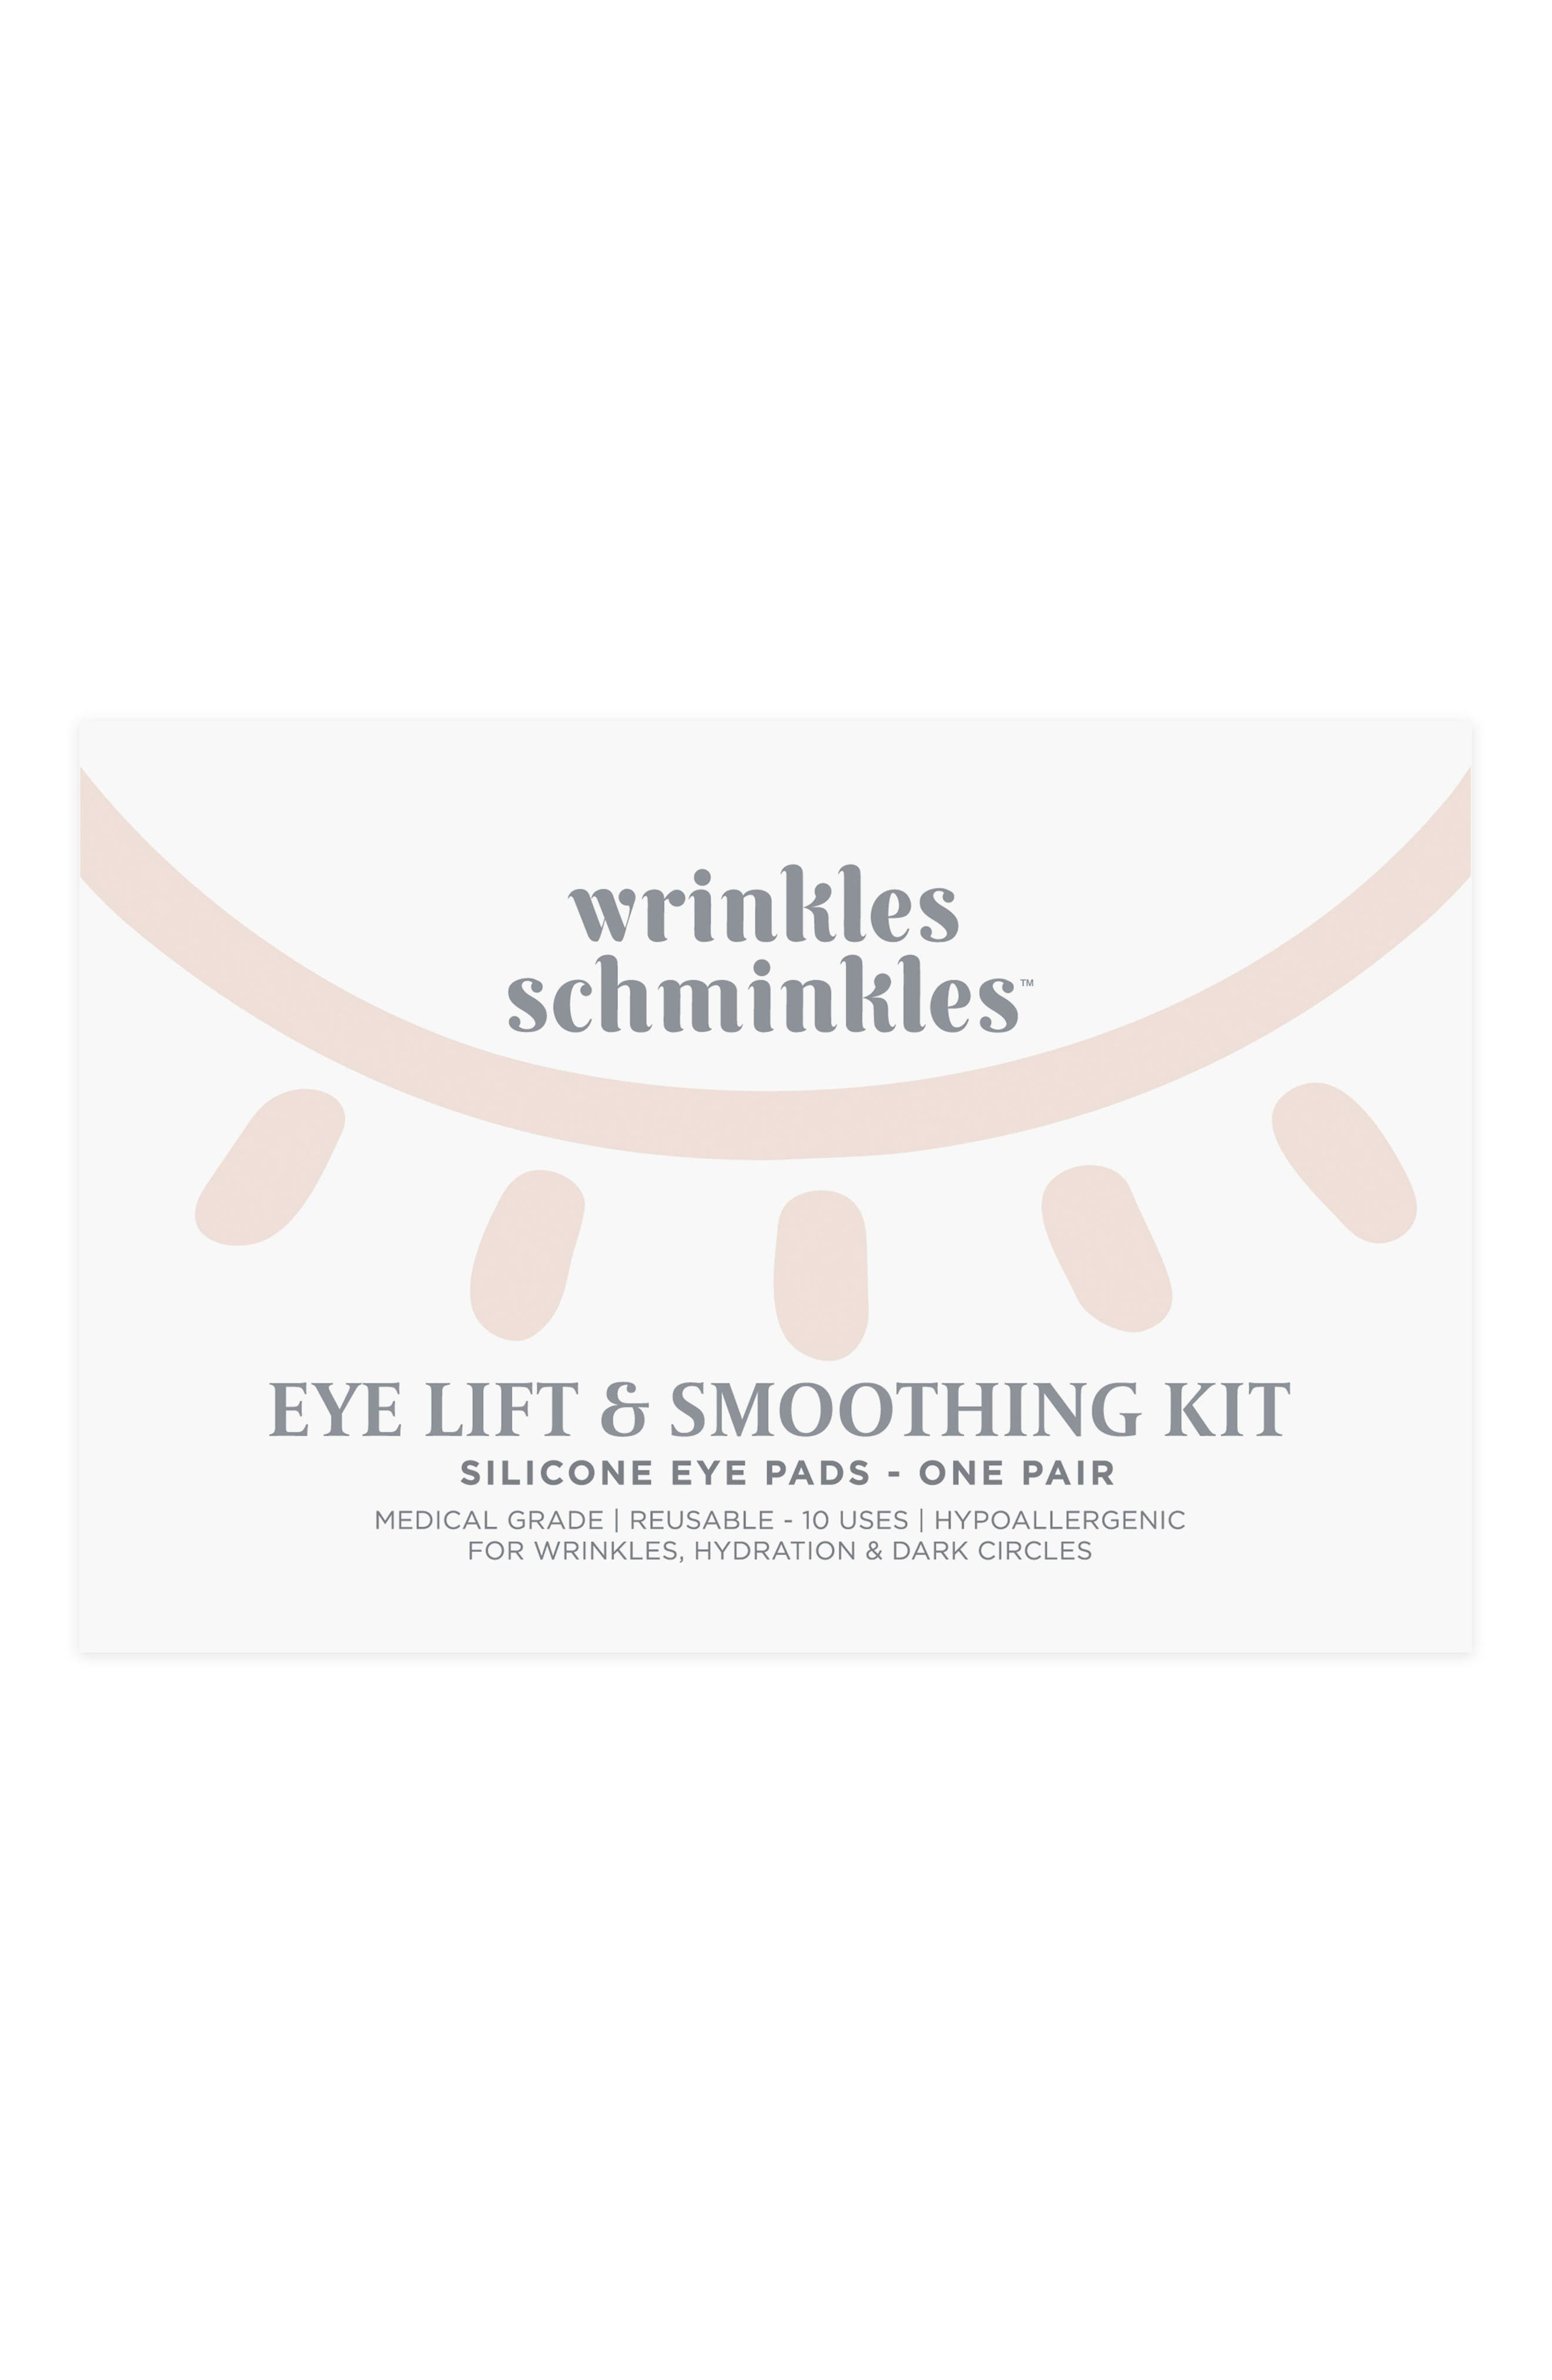 Eye Lift & Smoothing Eye Pads,                             Main thumbnail 1, color,                             No Color